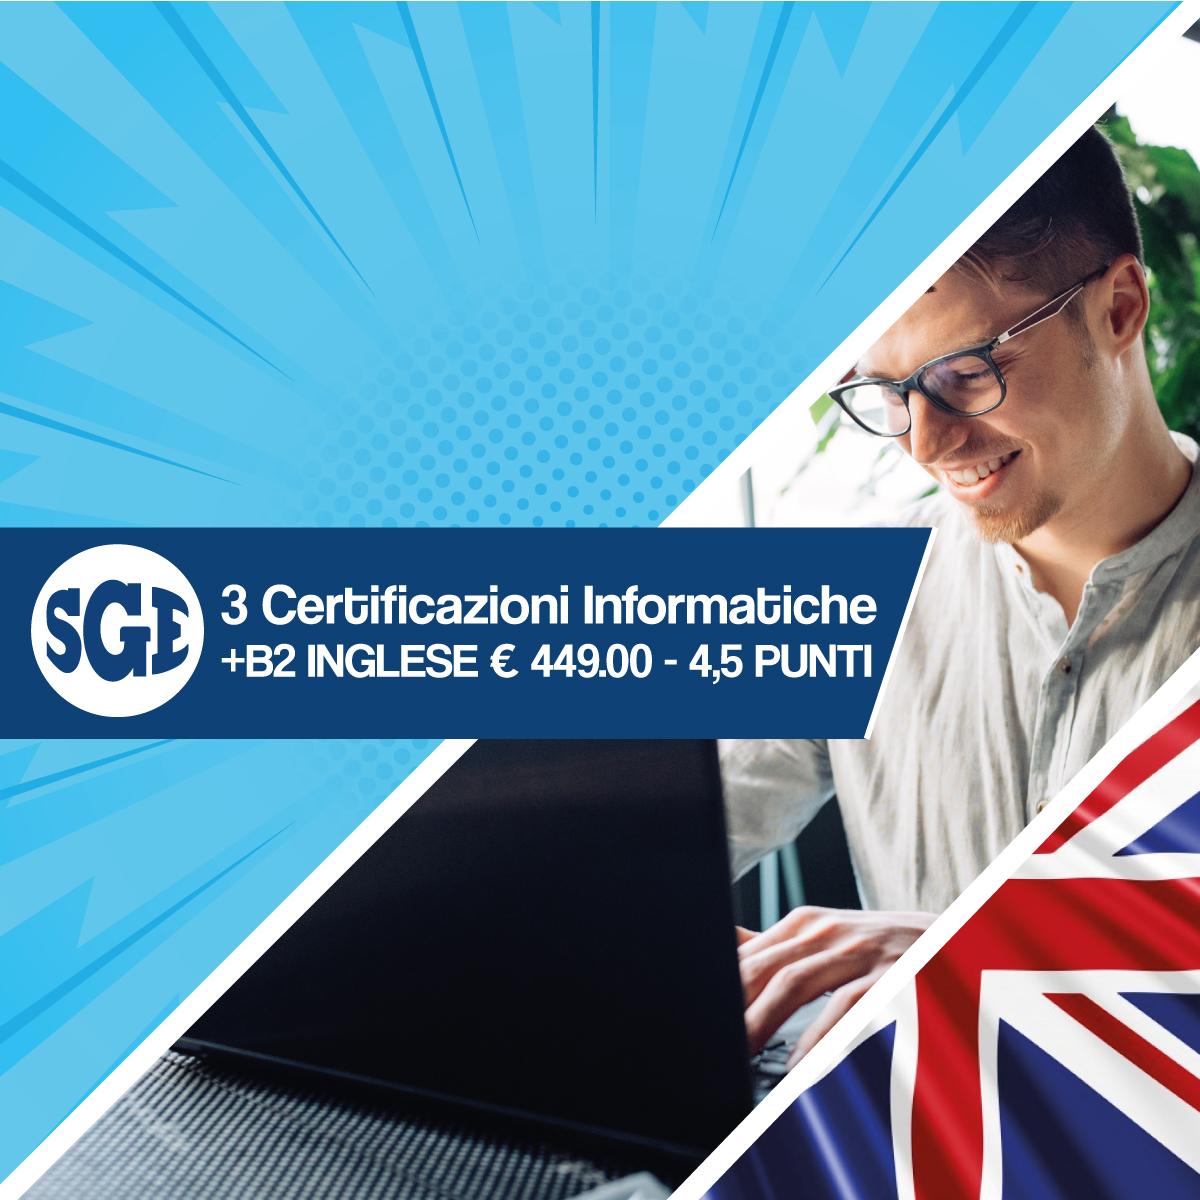 3 Certificazioni Informatiche +B2 INGLESE €499.00 - 4,5 PUNTI